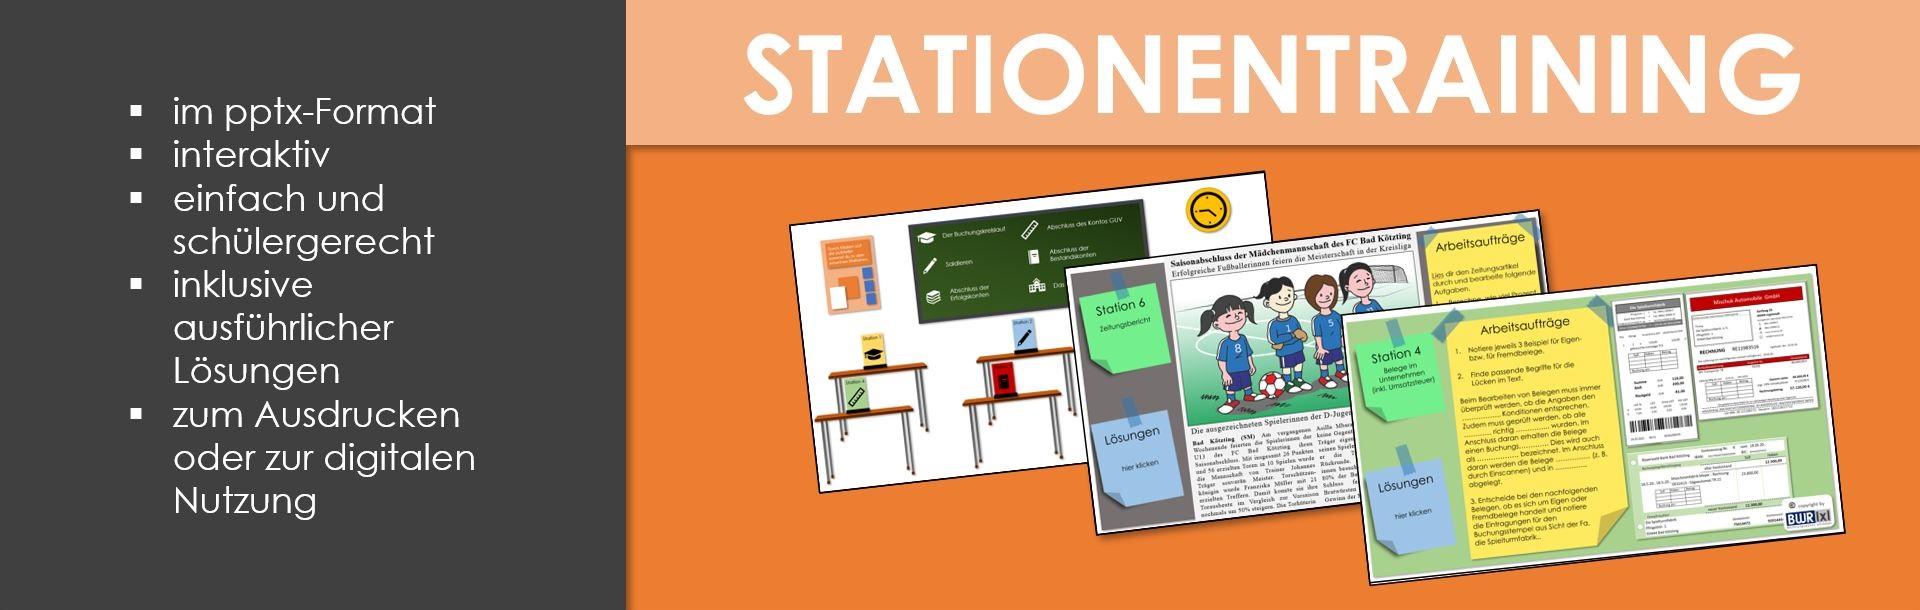 Stationentraining